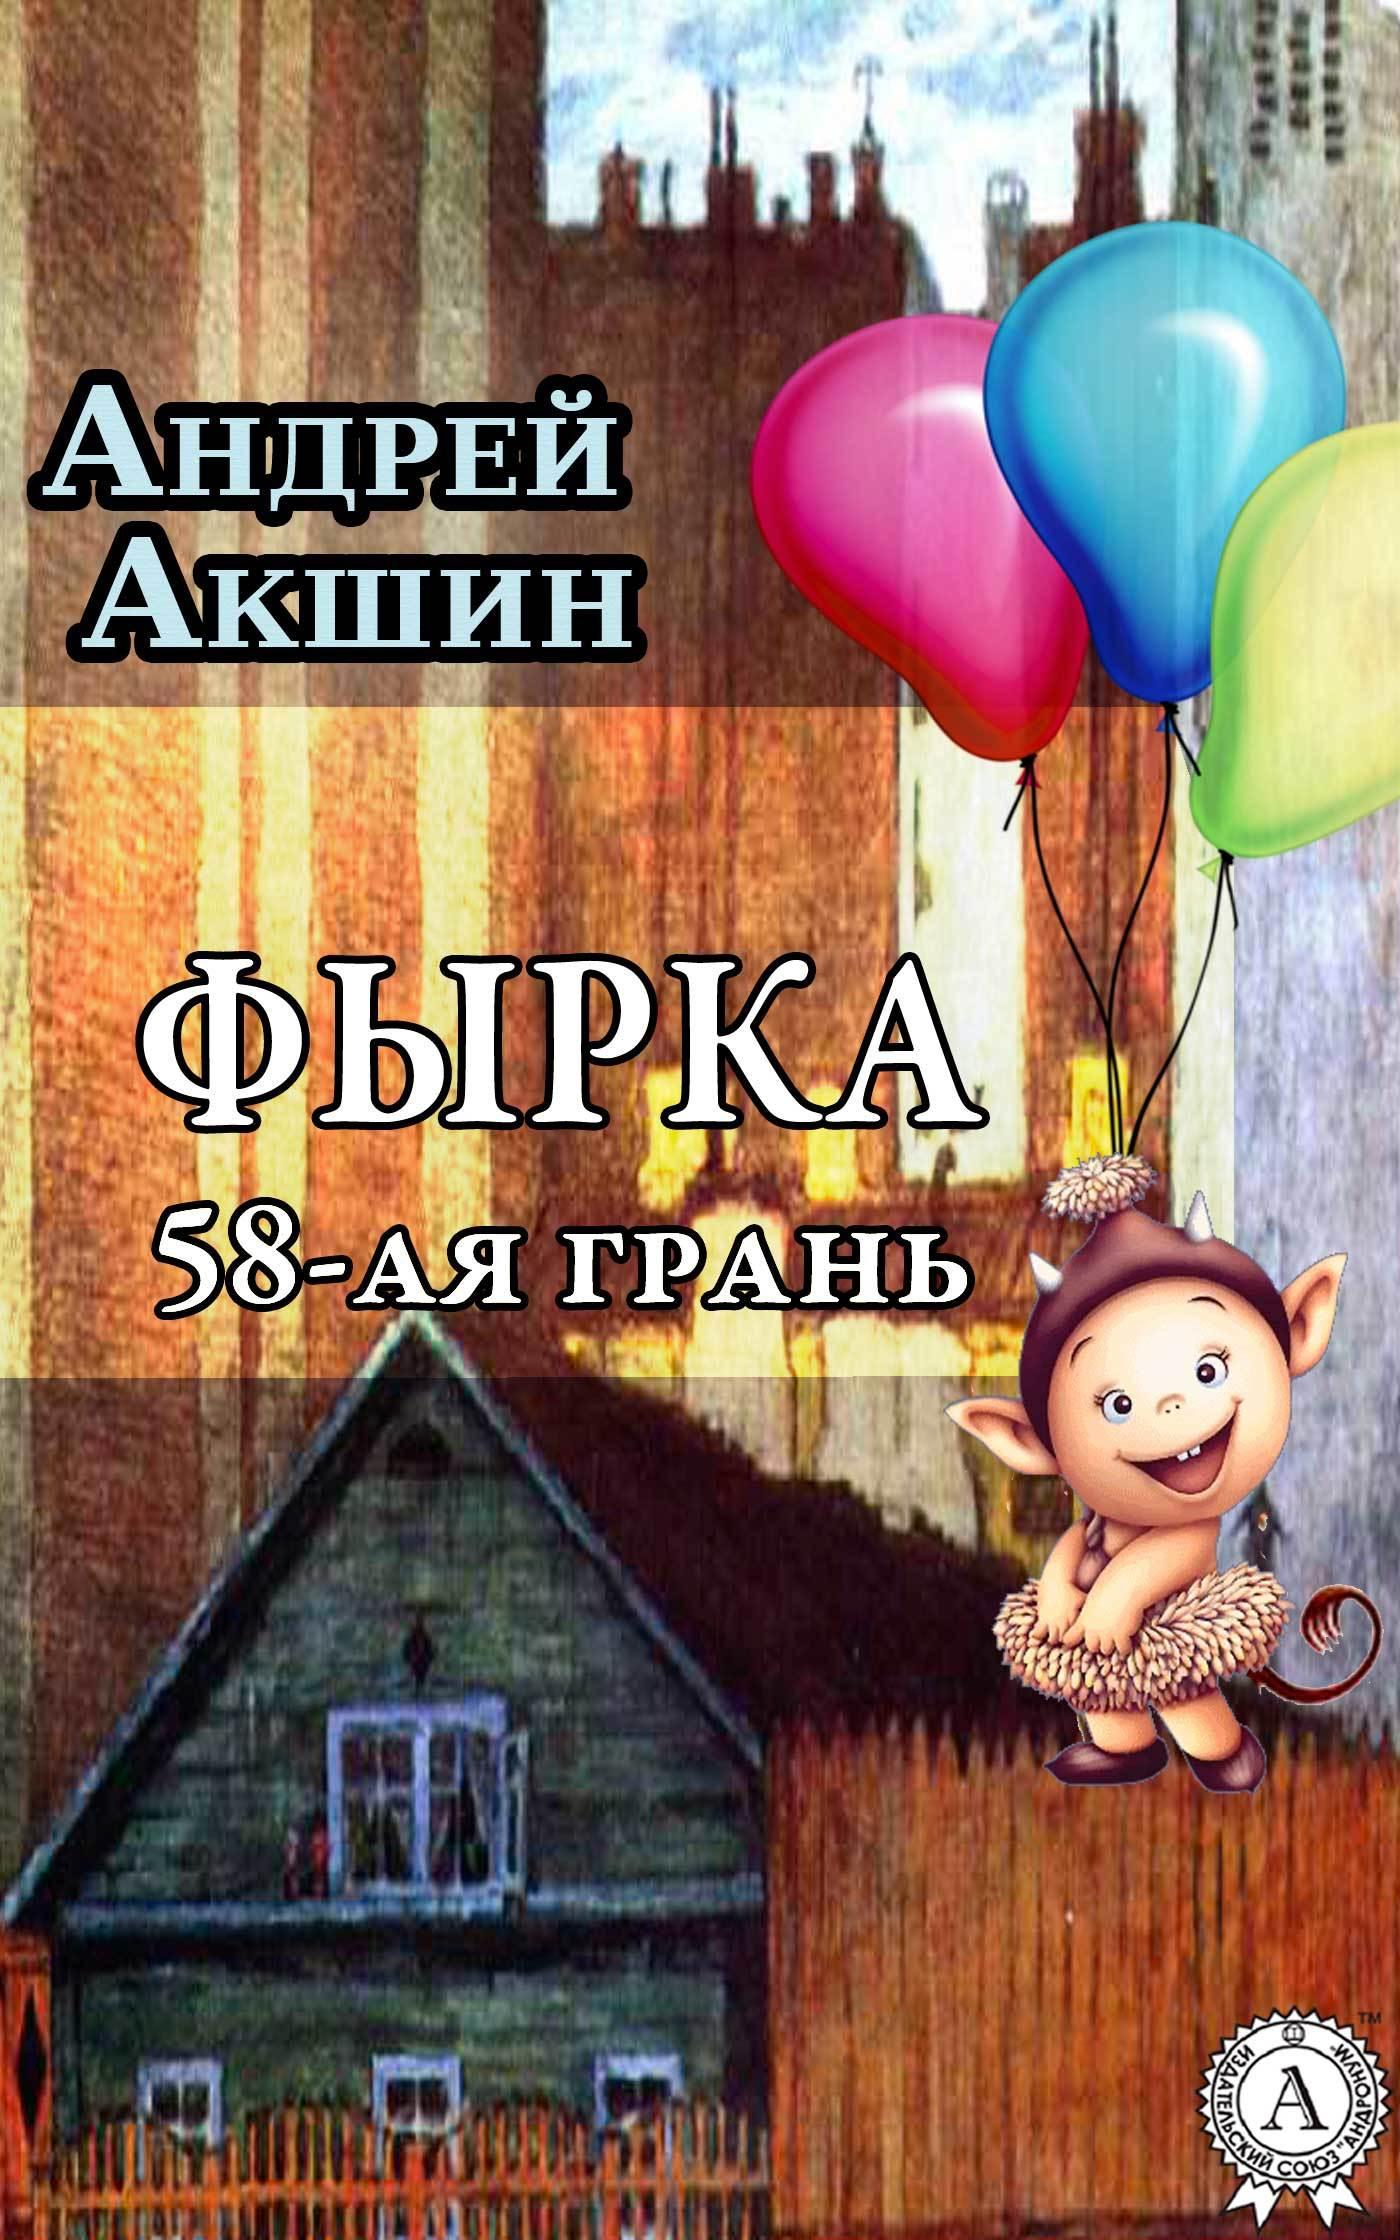 Андрей Акшин - Фырка. 58- ая грань